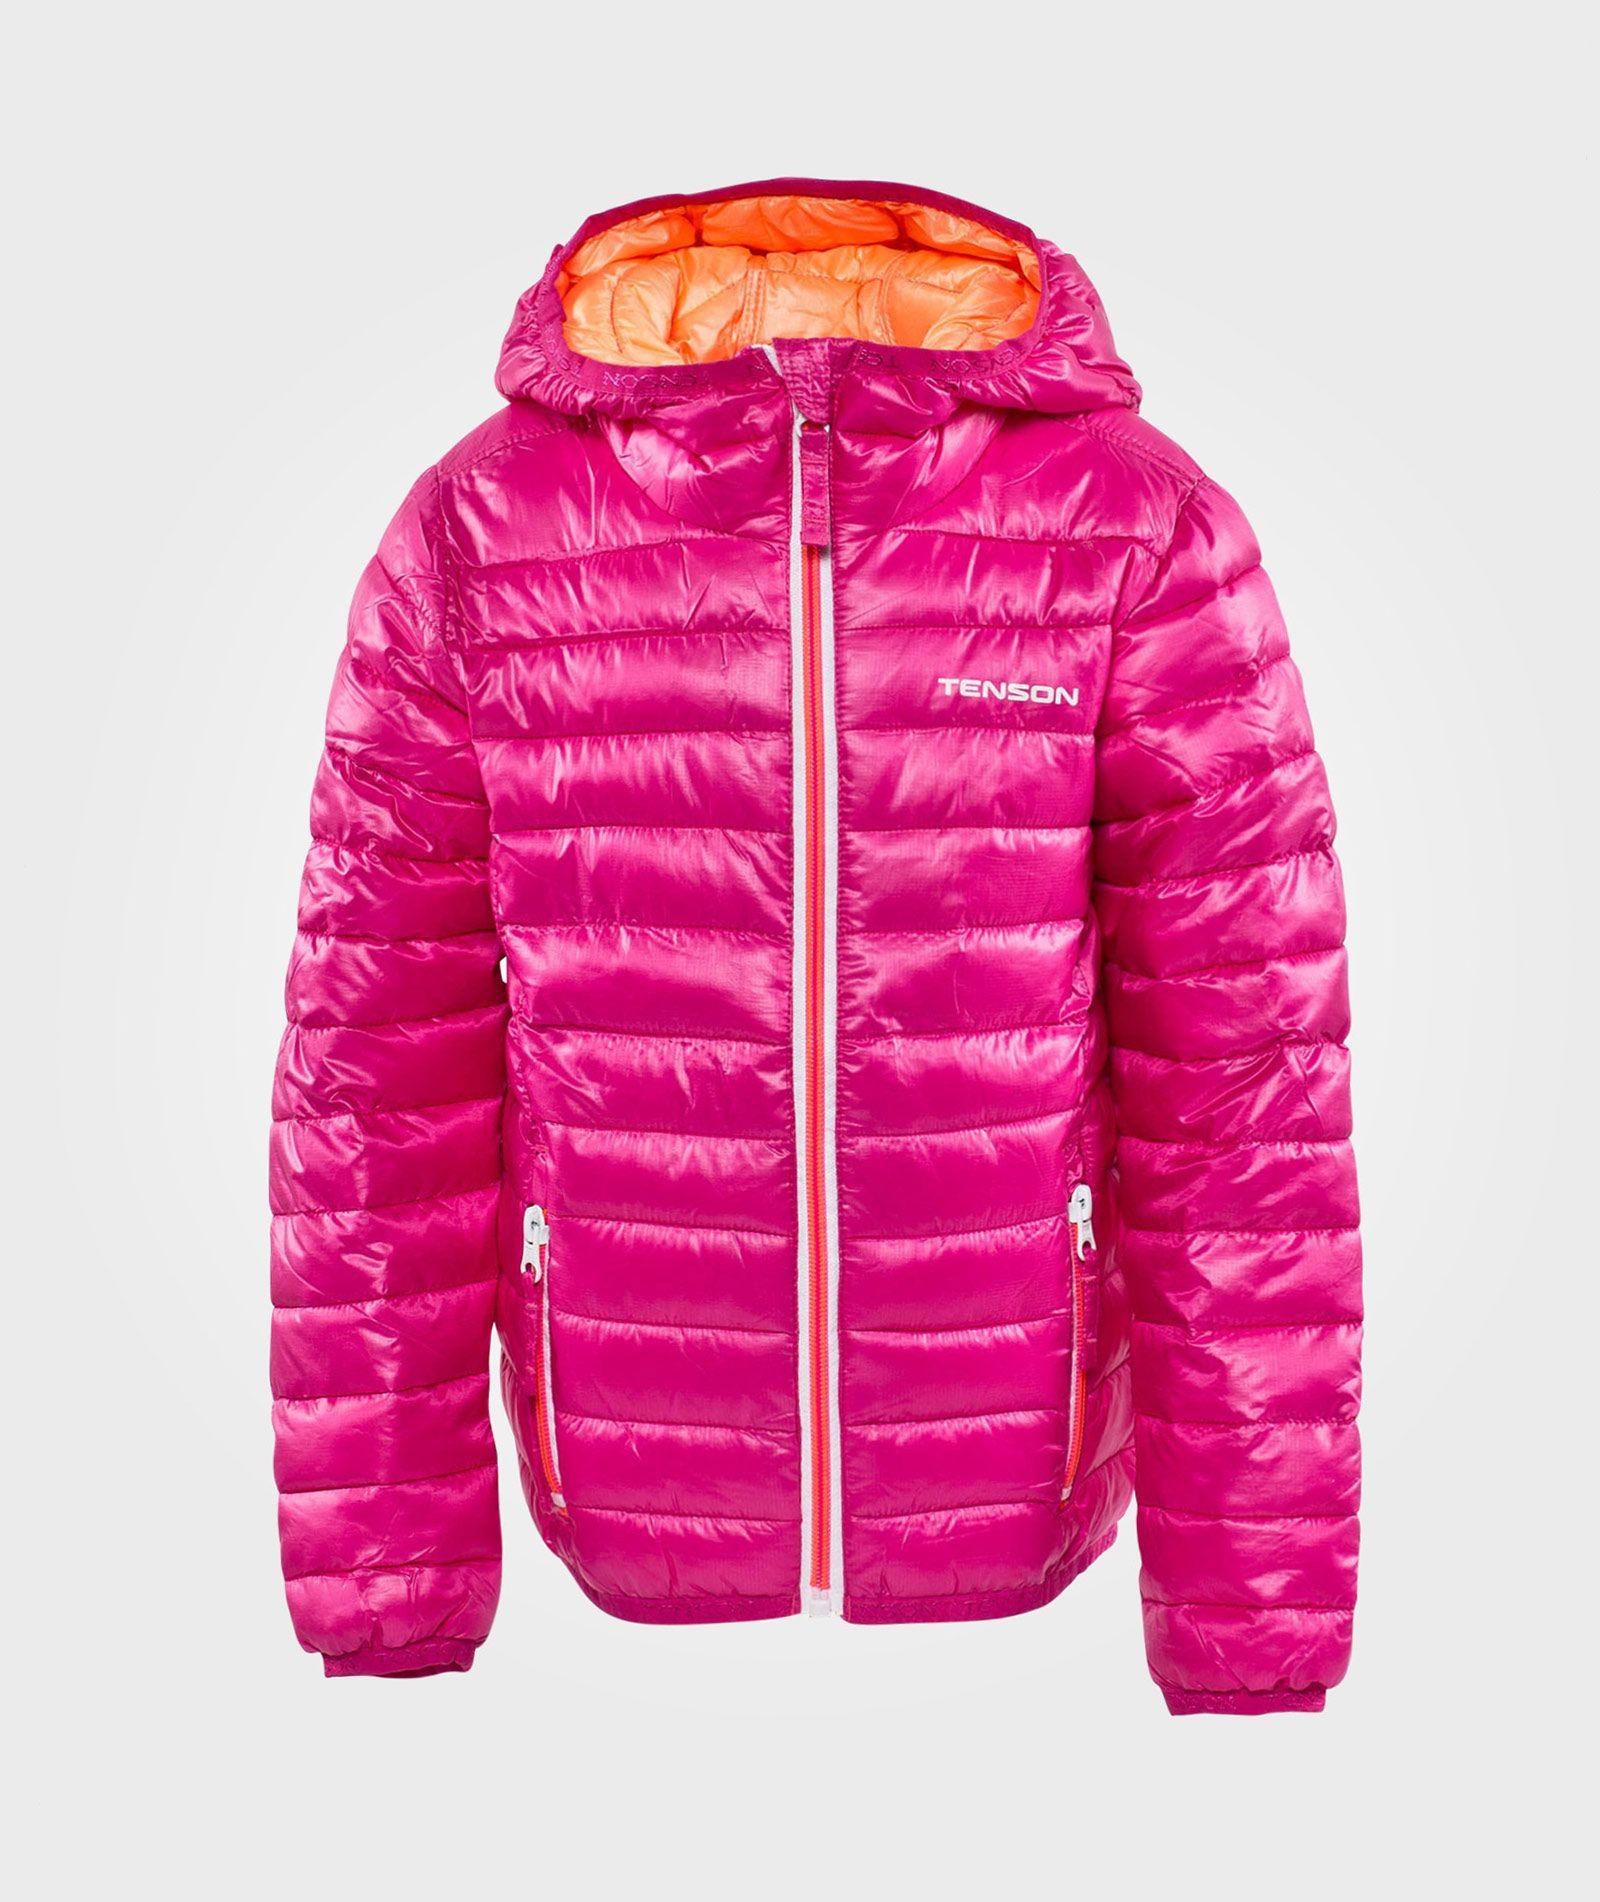 89e72293 Tenson Dash Cerise   ✯ Ytterkläder - Mid Season Sale   Winter ...